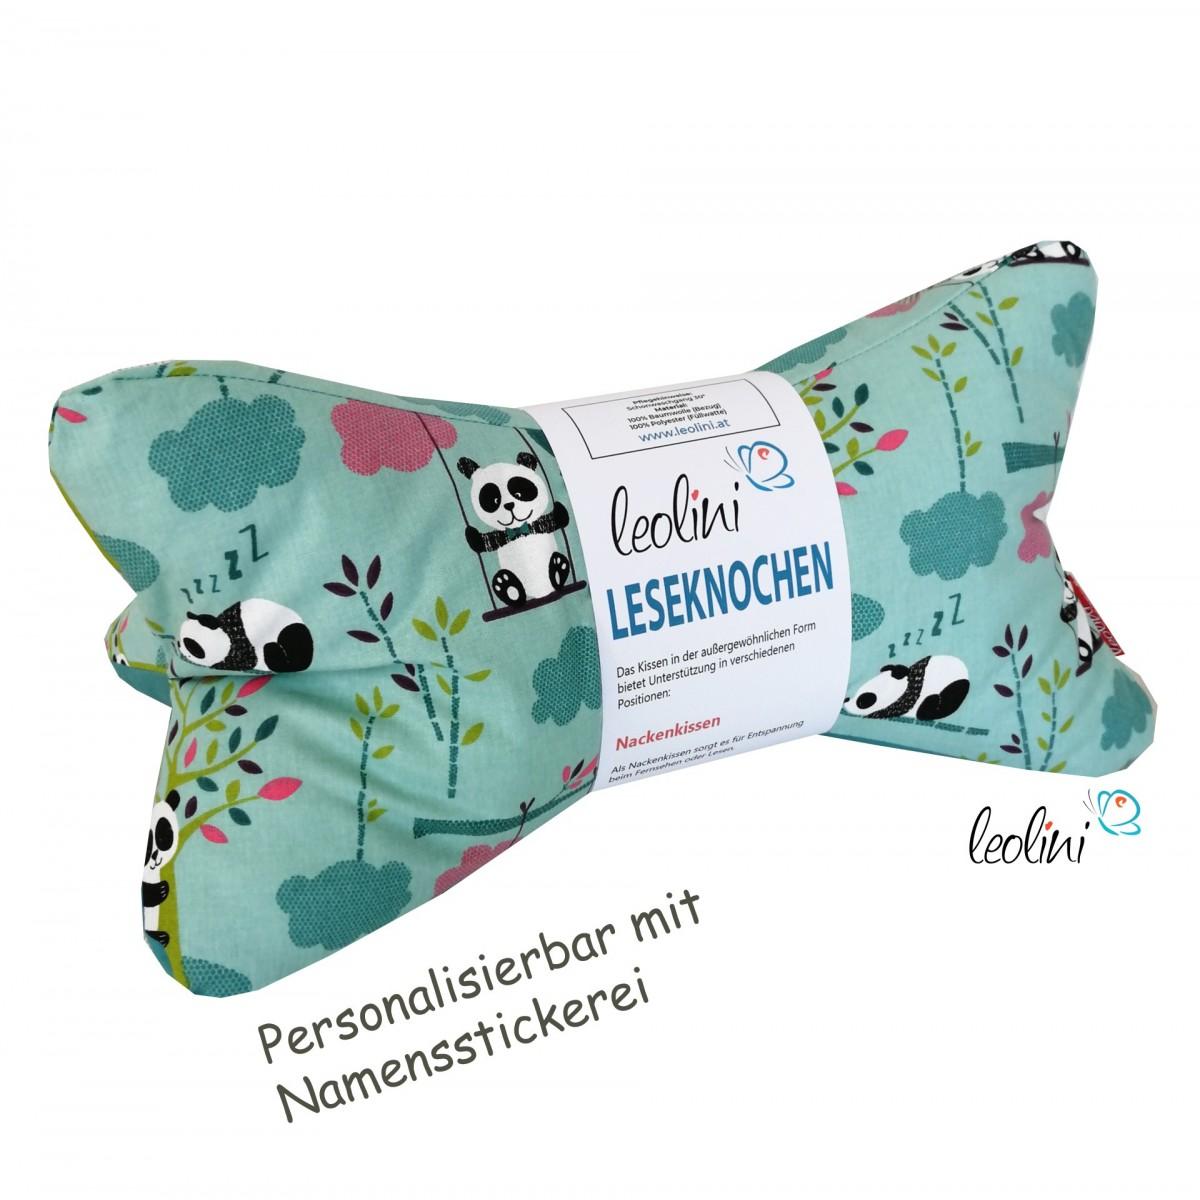 Personalisierbarer Leseknochen - Lesekissen von Leolini Panda türkis Namensstickerei